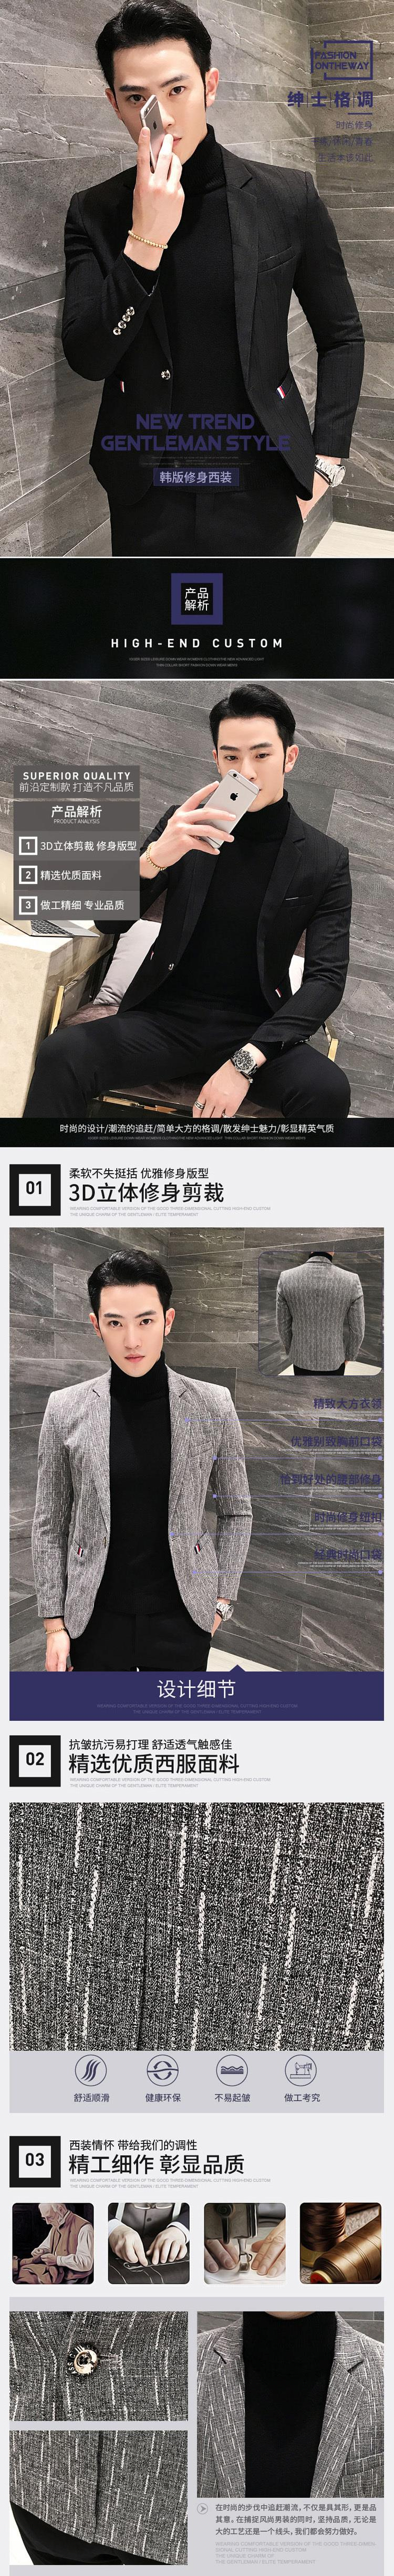 c7a93f588d 2019 Blazer Hombre 2018 New Brand Slim Fit Casual Blazer Men Grey ...